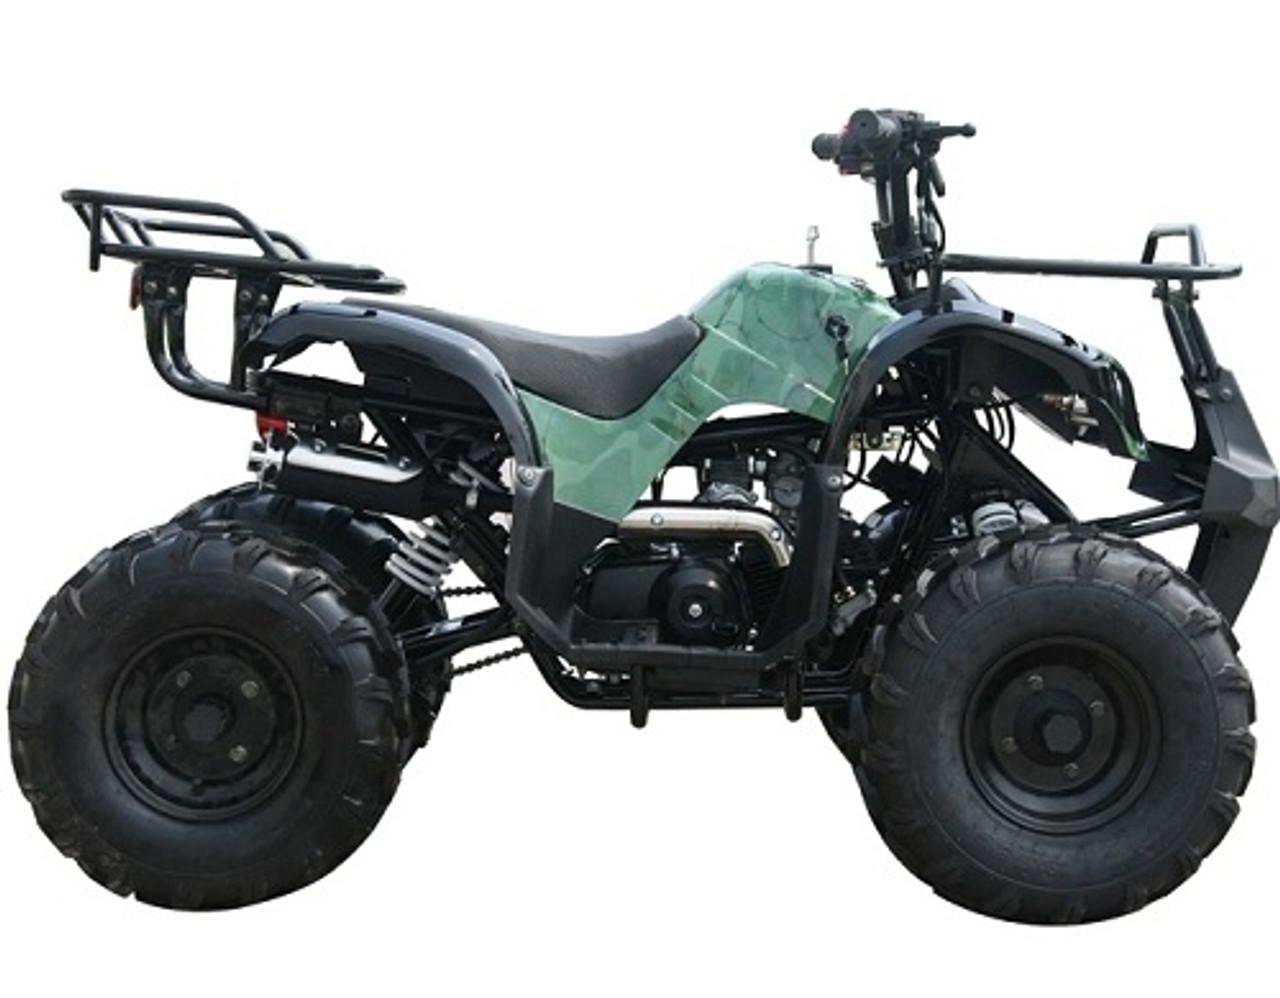 kodiak-hd 125cc mid size atv with reverse